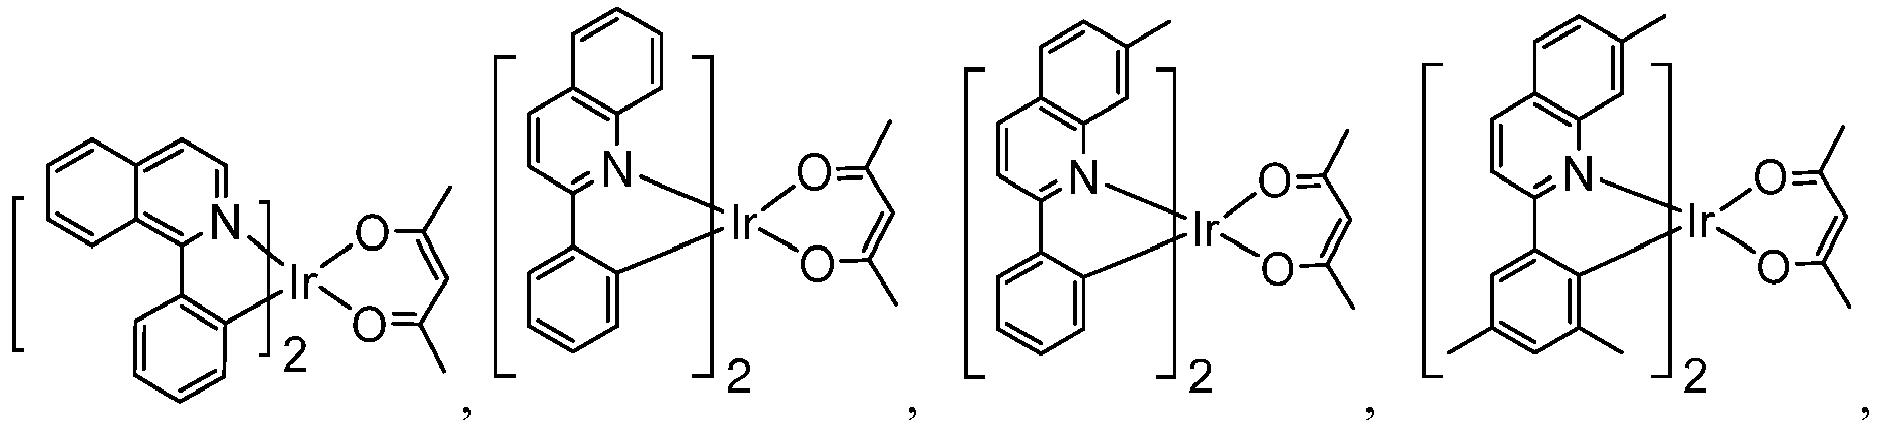 Figure imgb0909